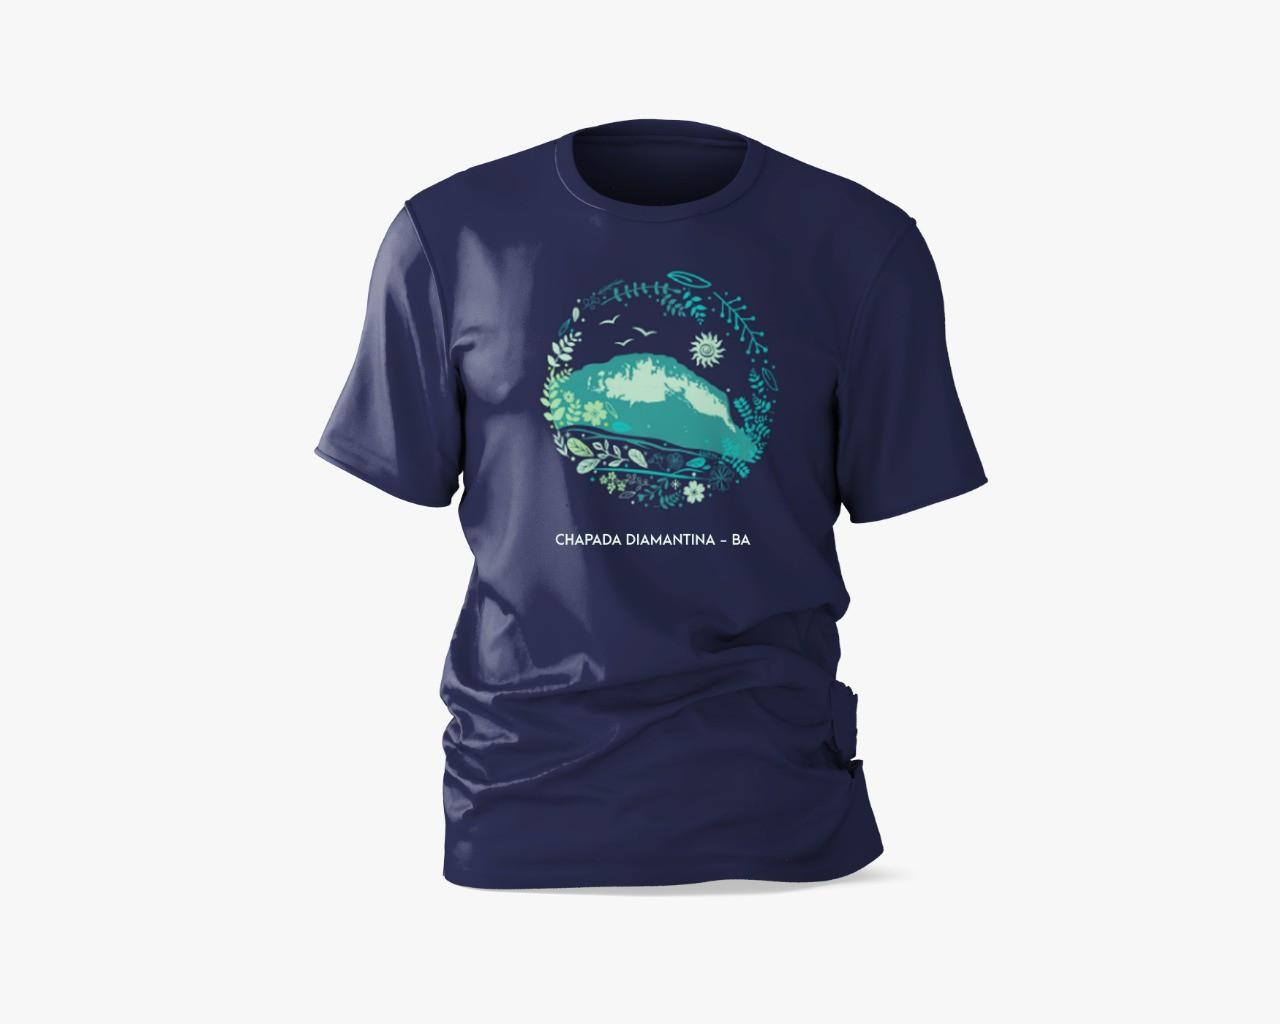 Camisa Chapada Diamantina - MORRO BRANCO